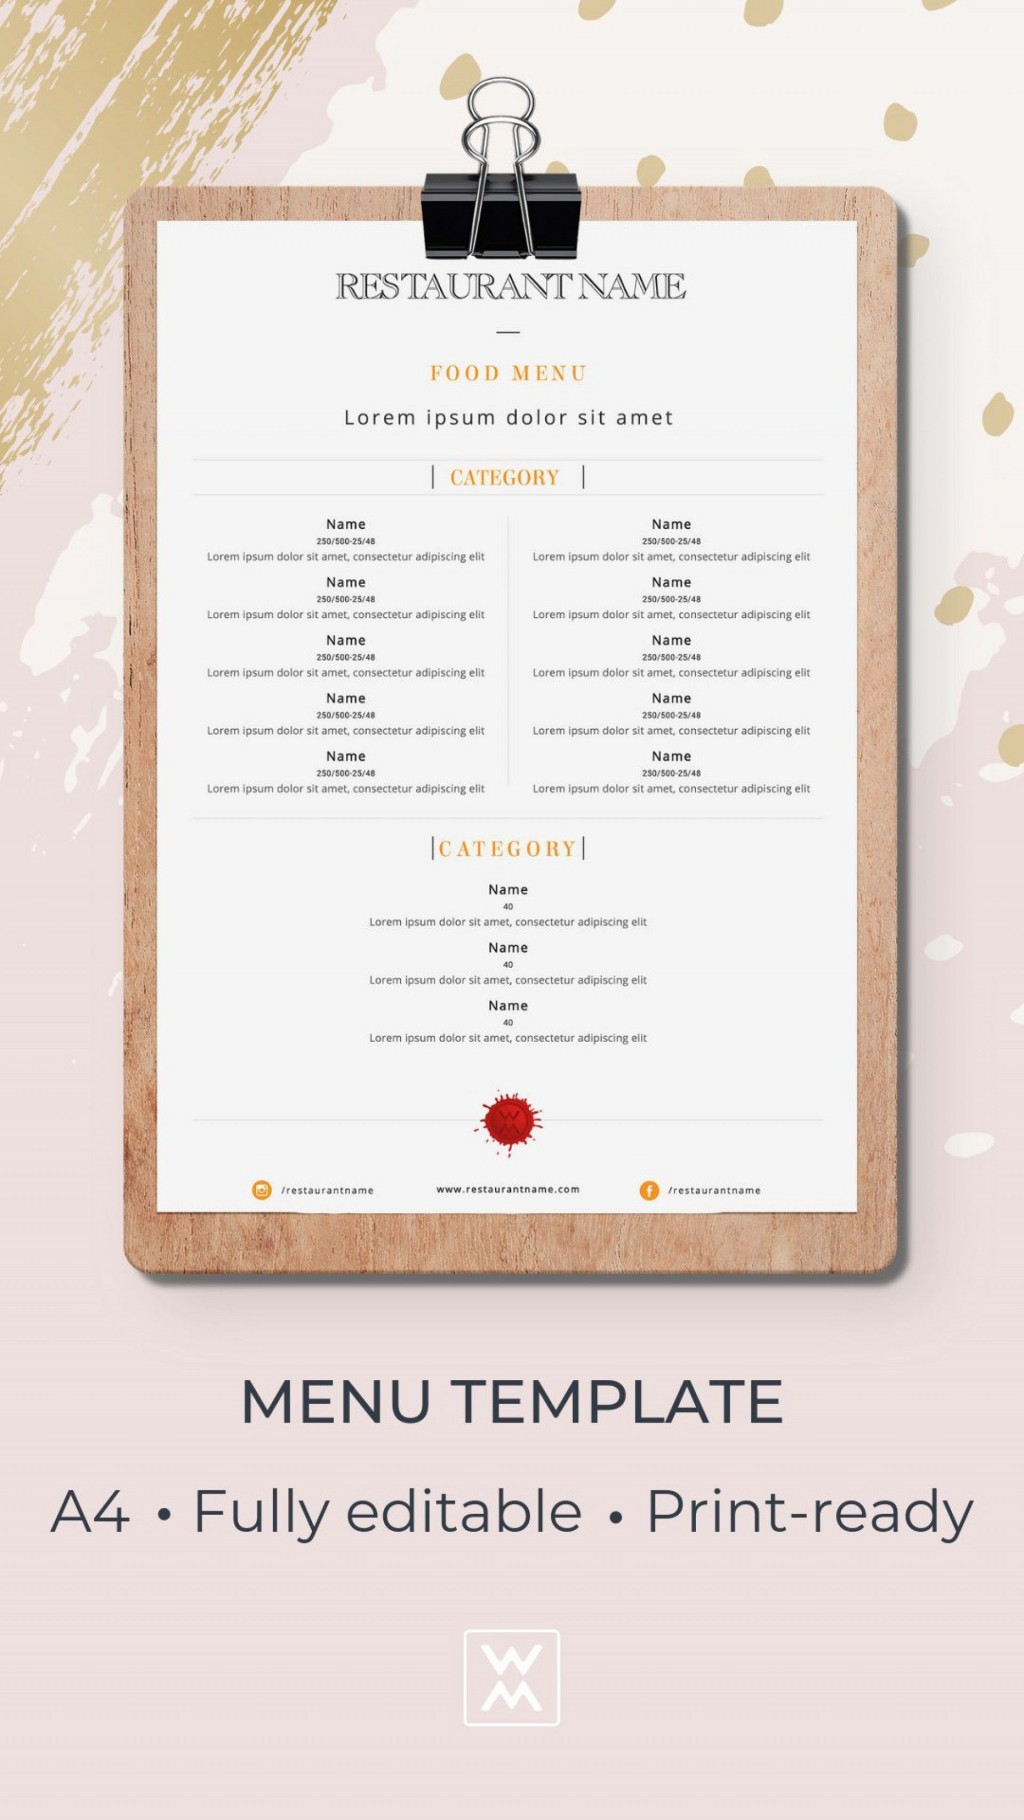 001 Striking Free Online Wedding Menu Template Example  TemplatesLarge